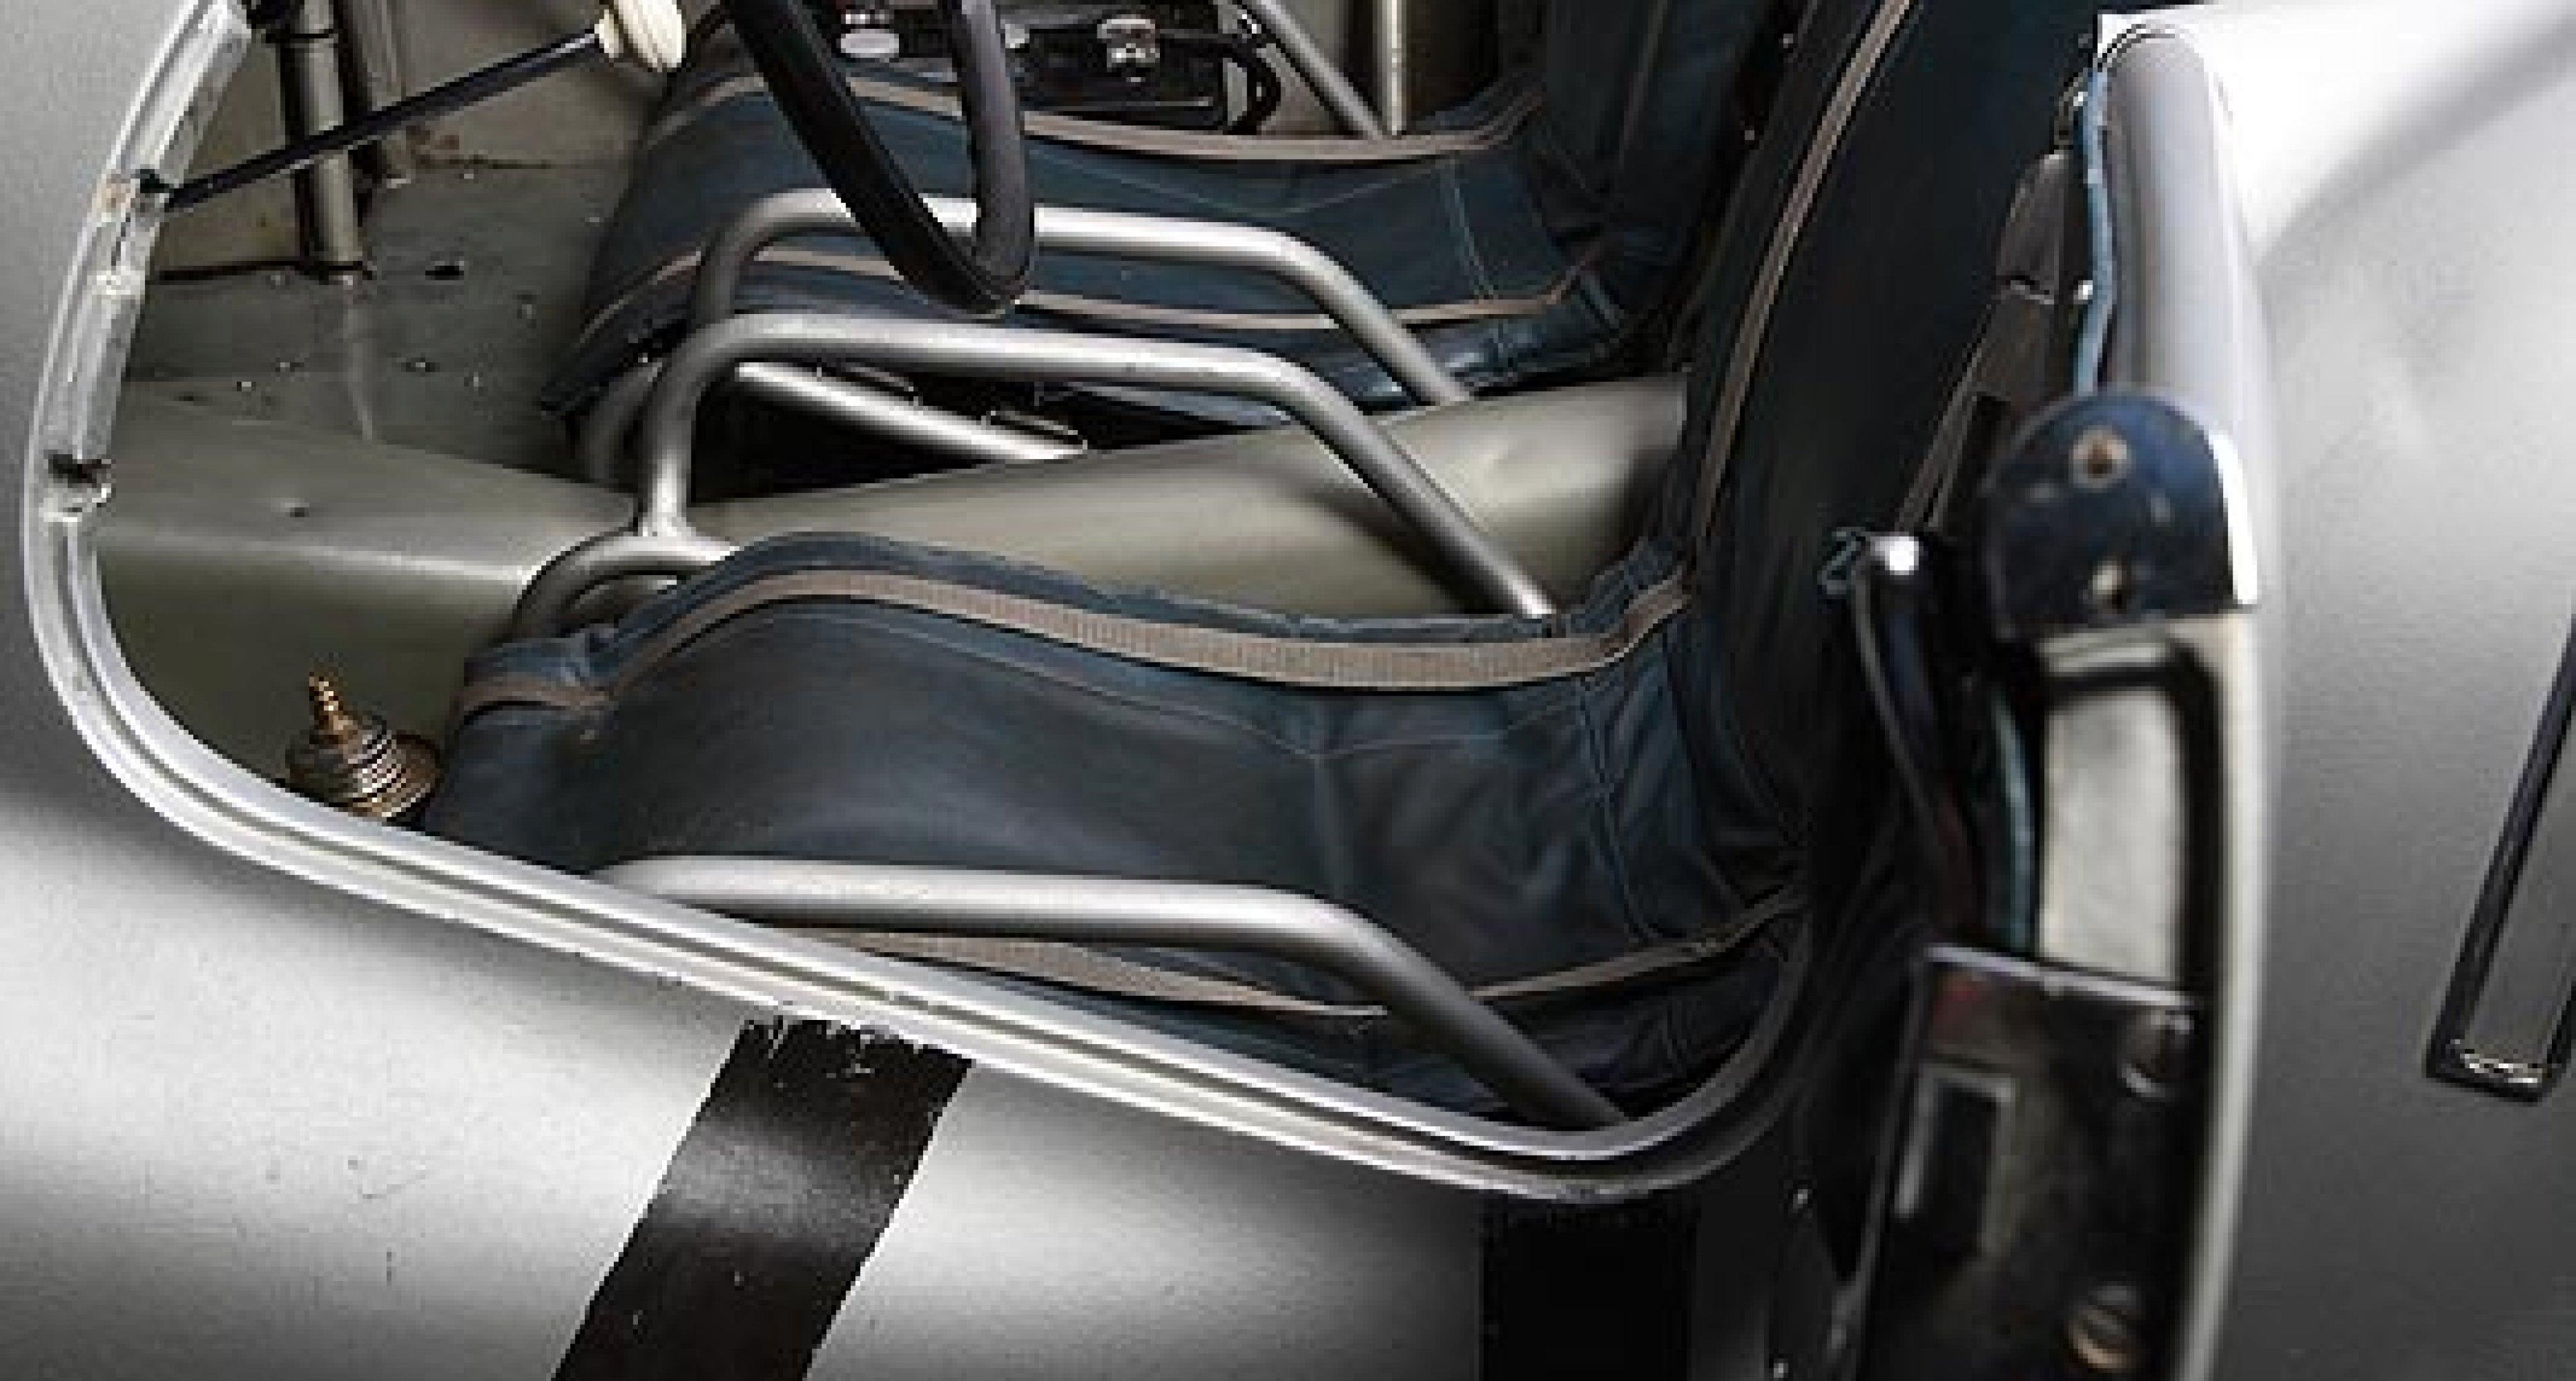 BMW Mille Miglia 'Buegelfalte' in RM's Monaco Sale